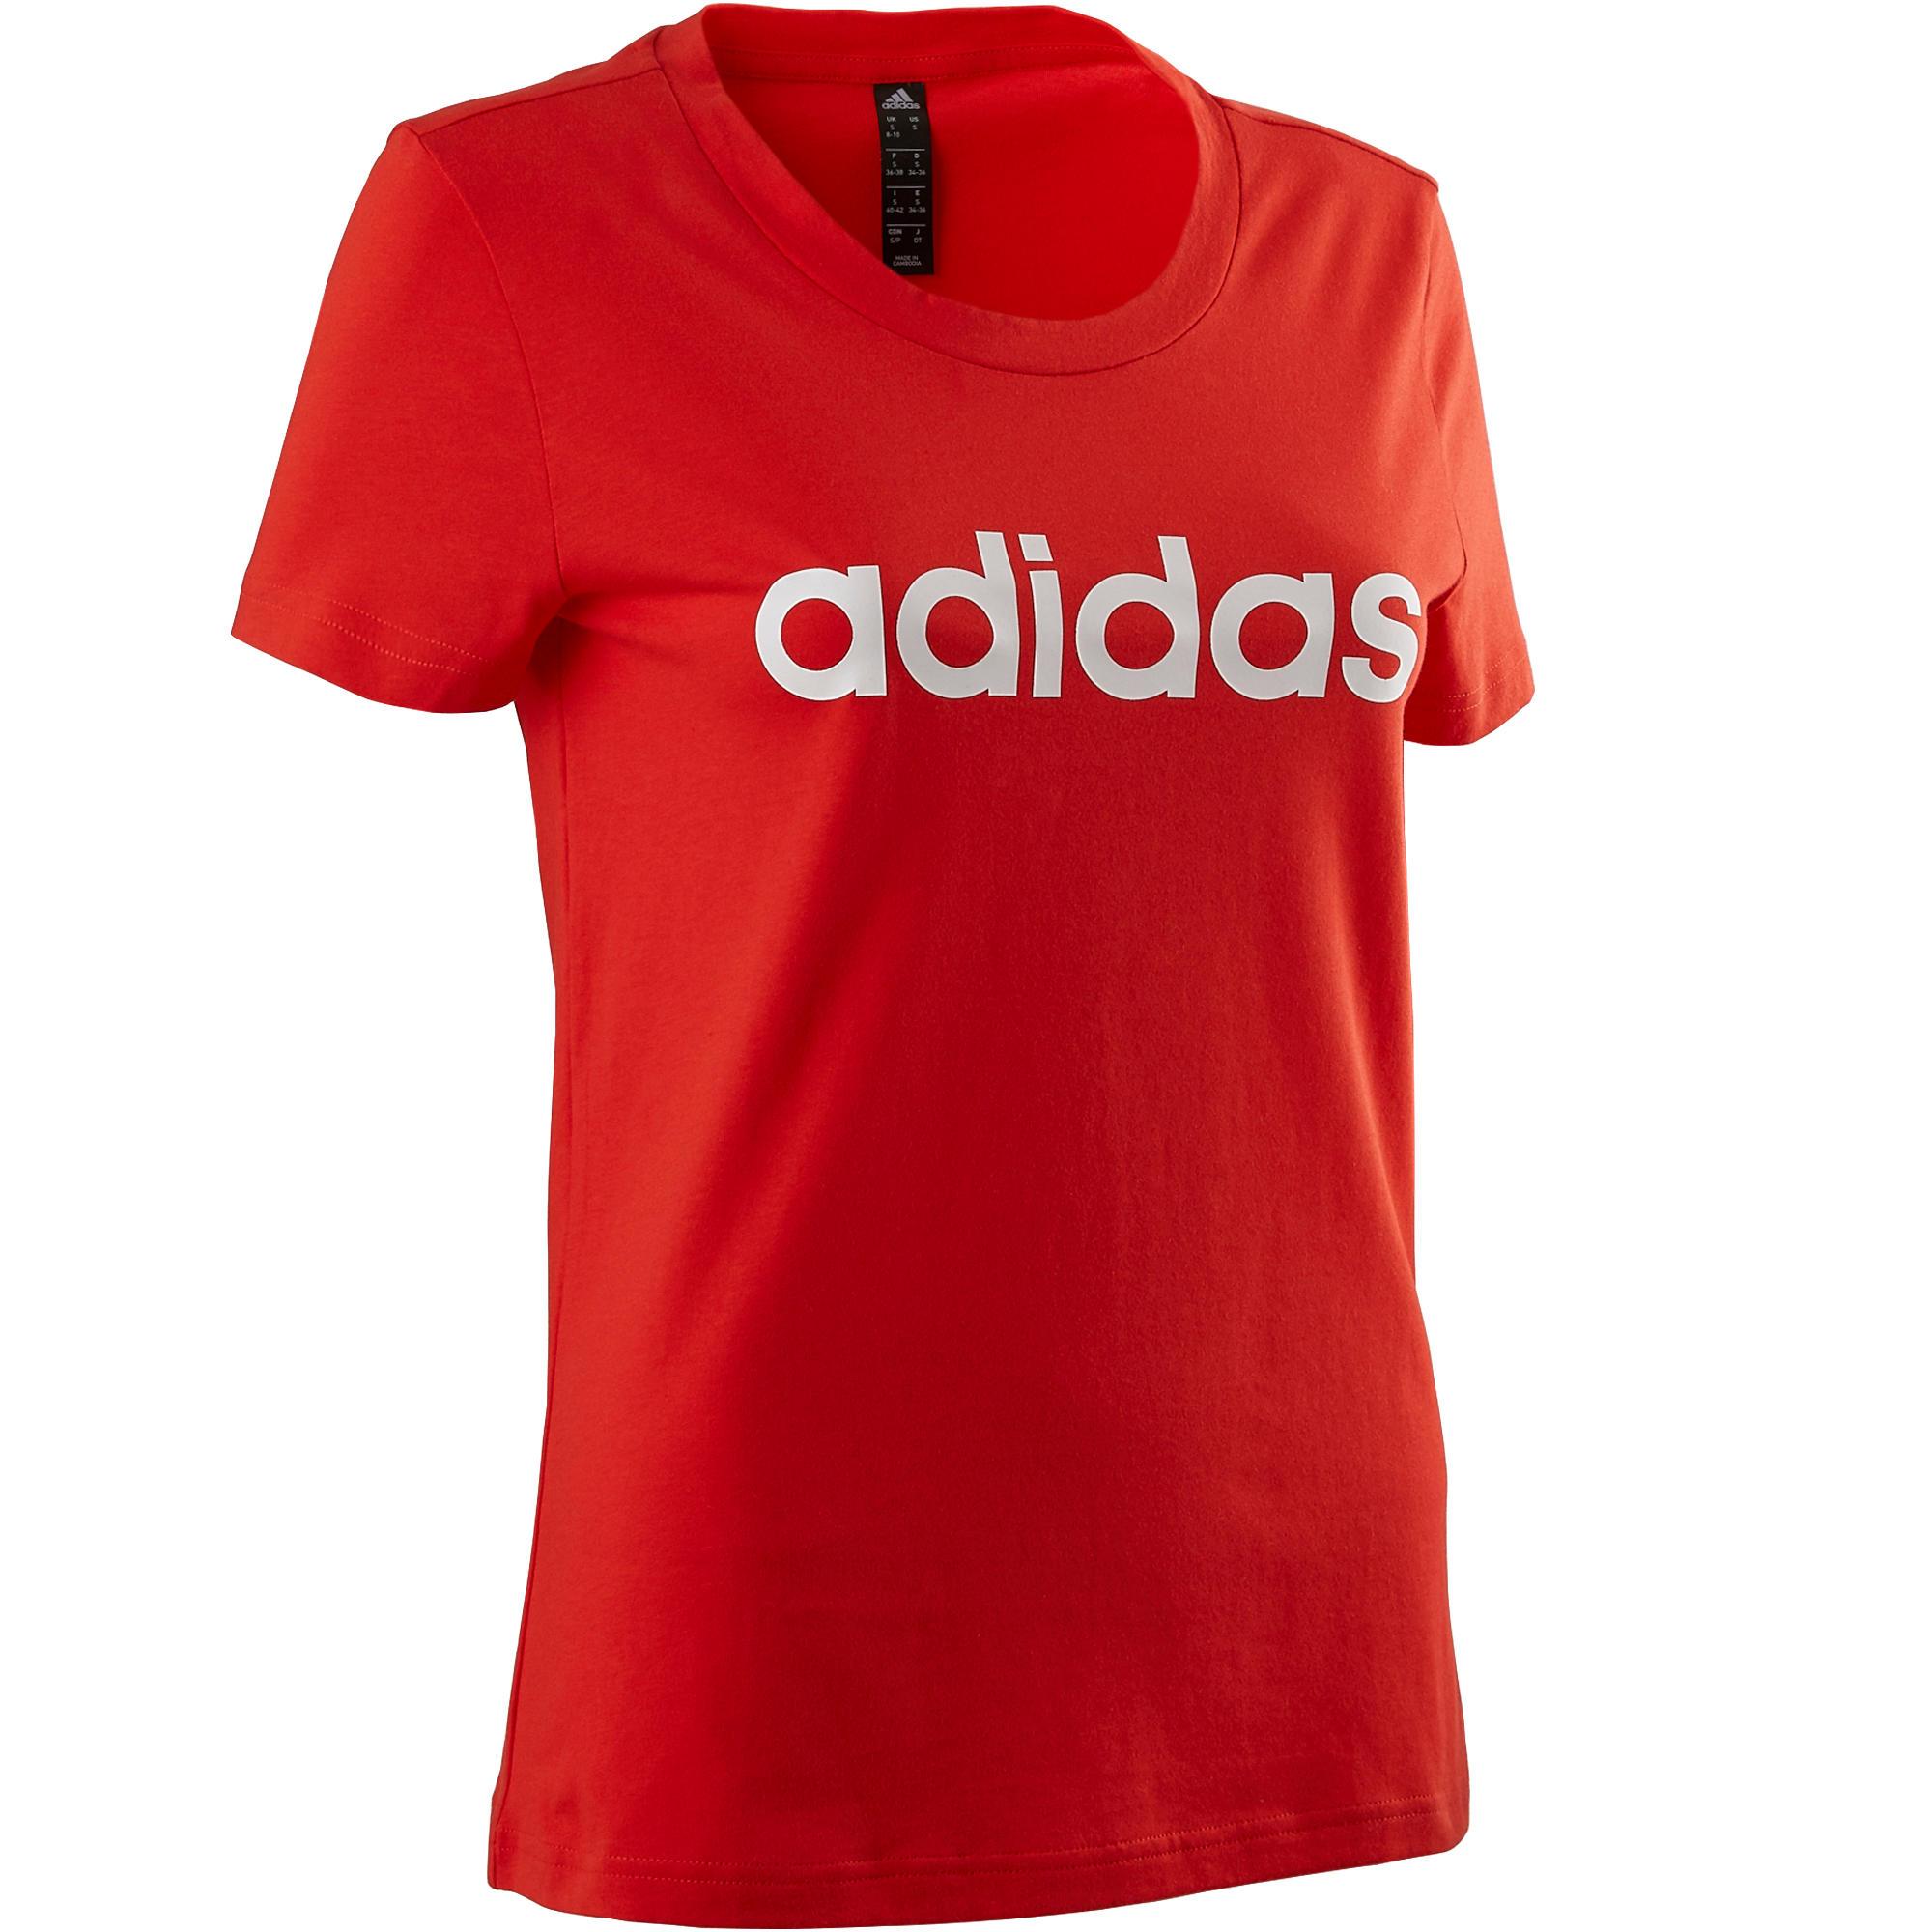 Adidas T-shirt Adidas 500 pilates lichte gym dames rood/wit